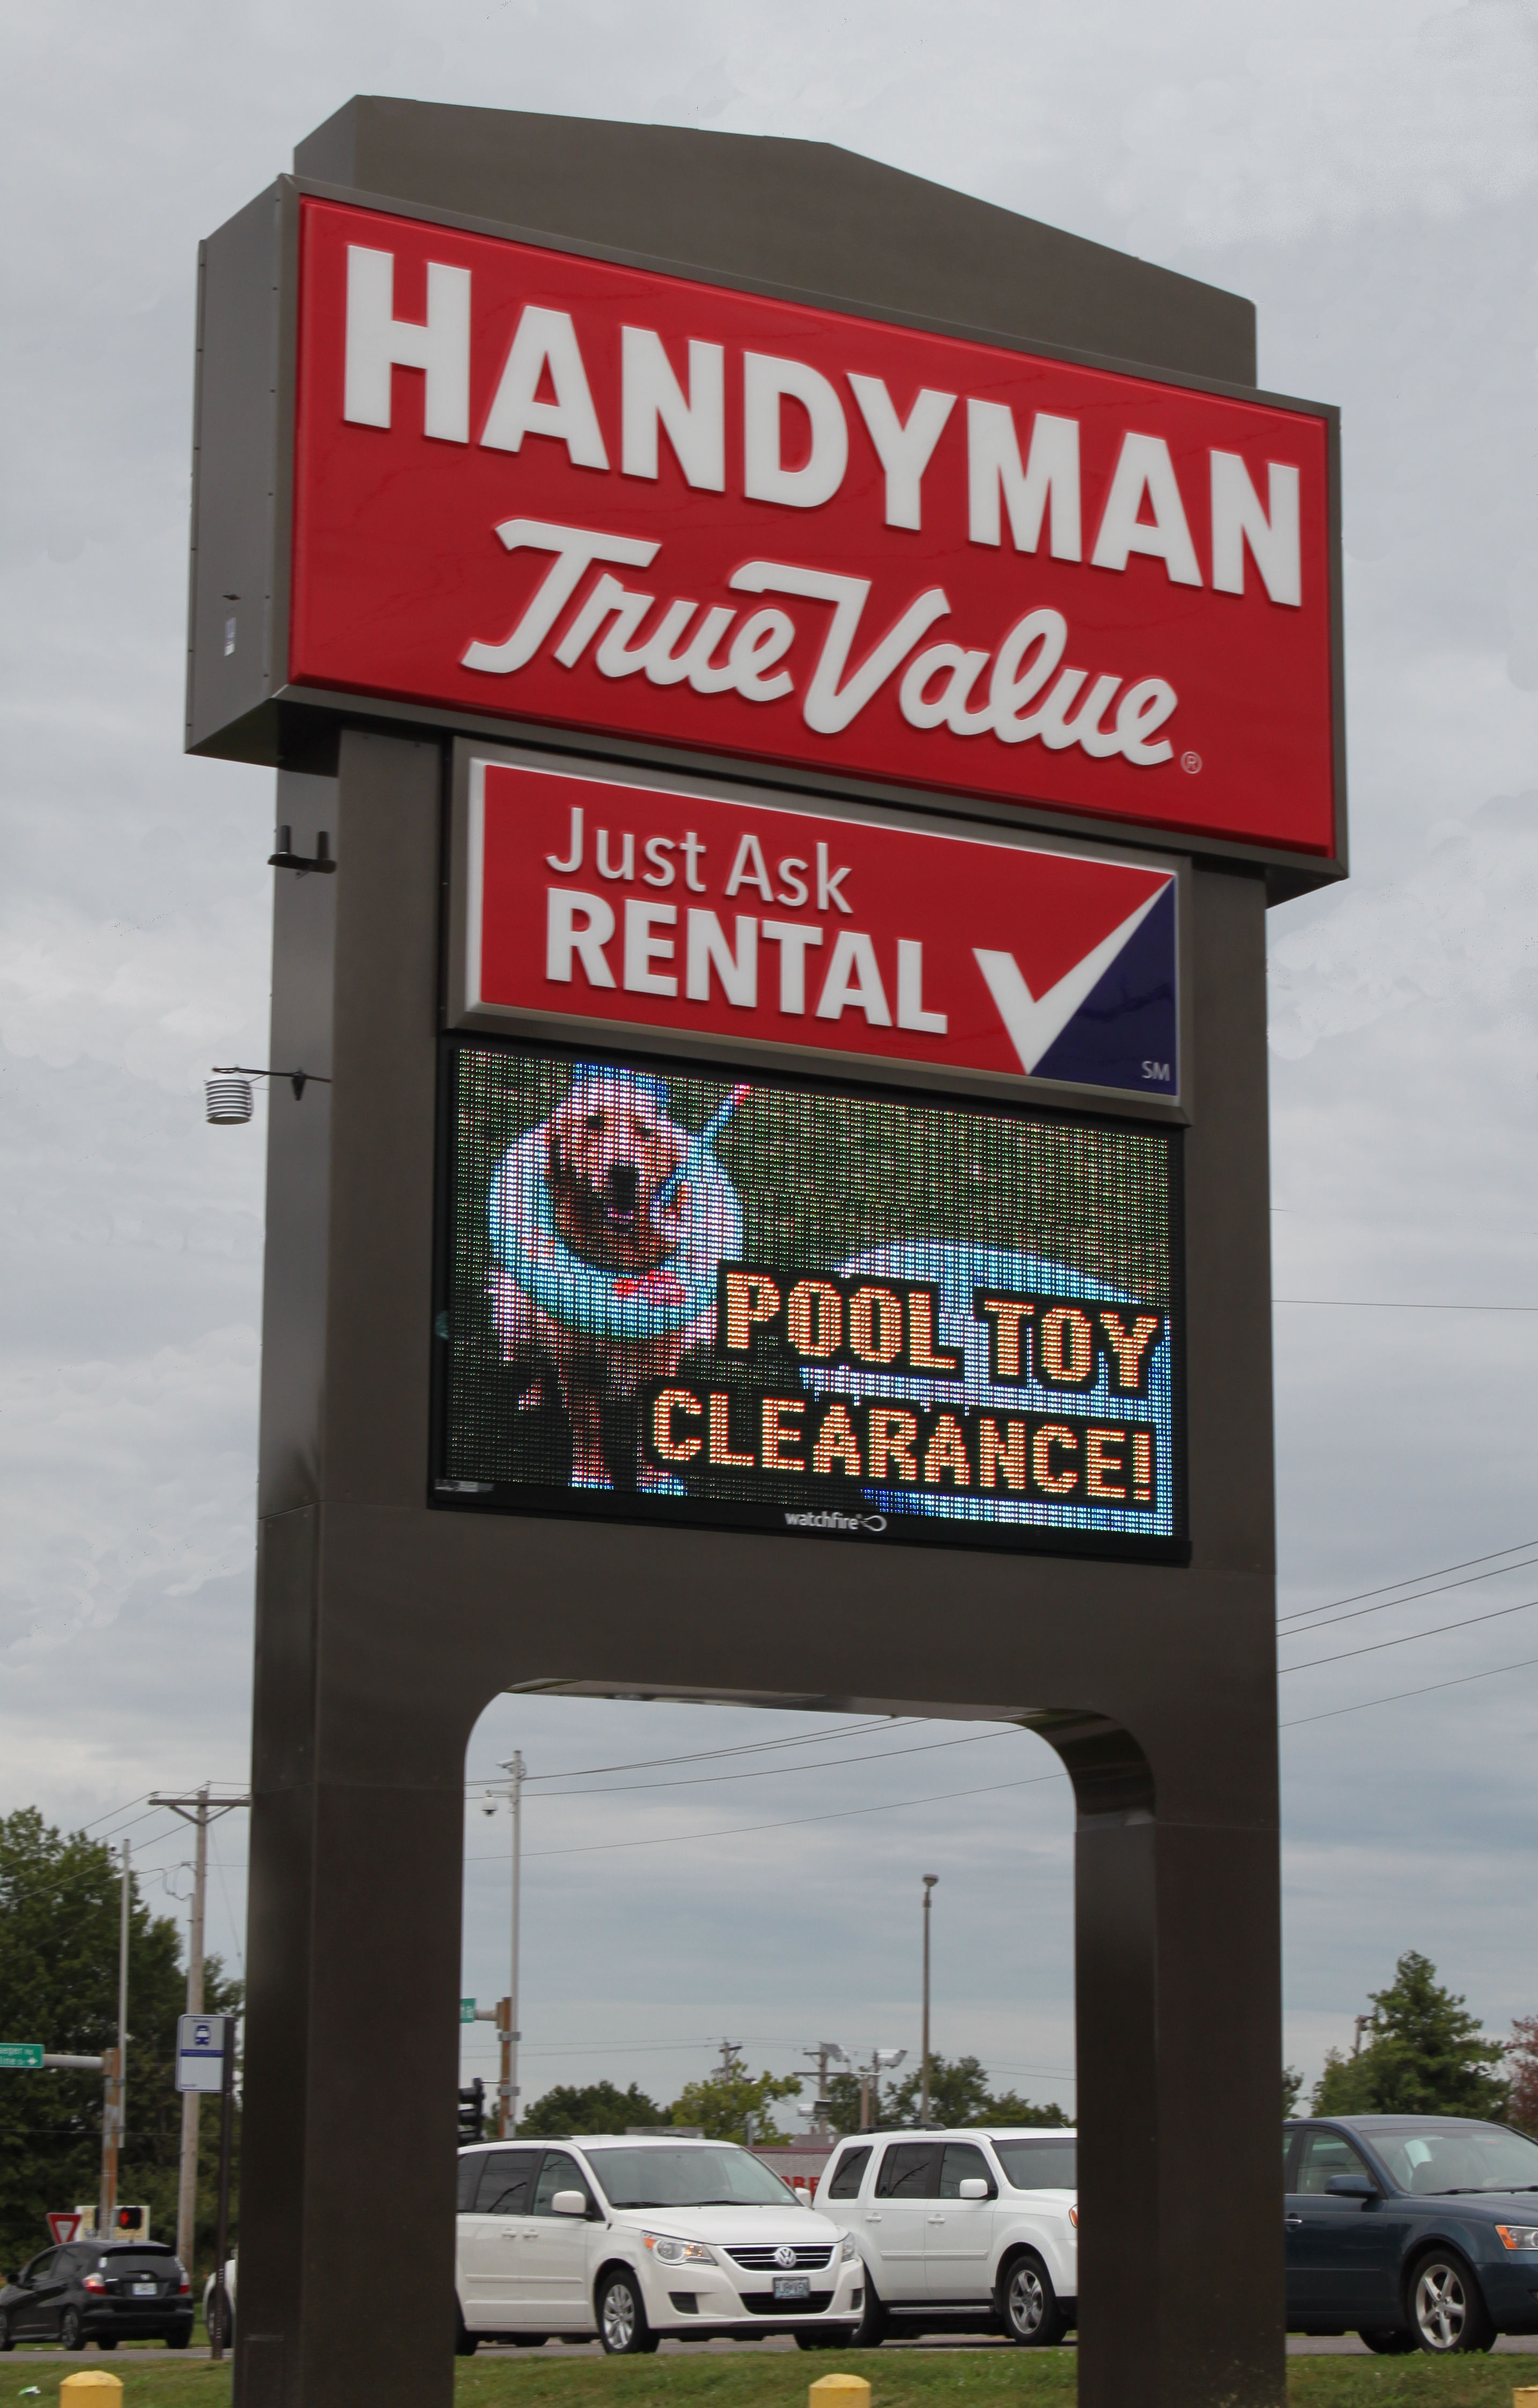 Handyman True Value, St. Louis